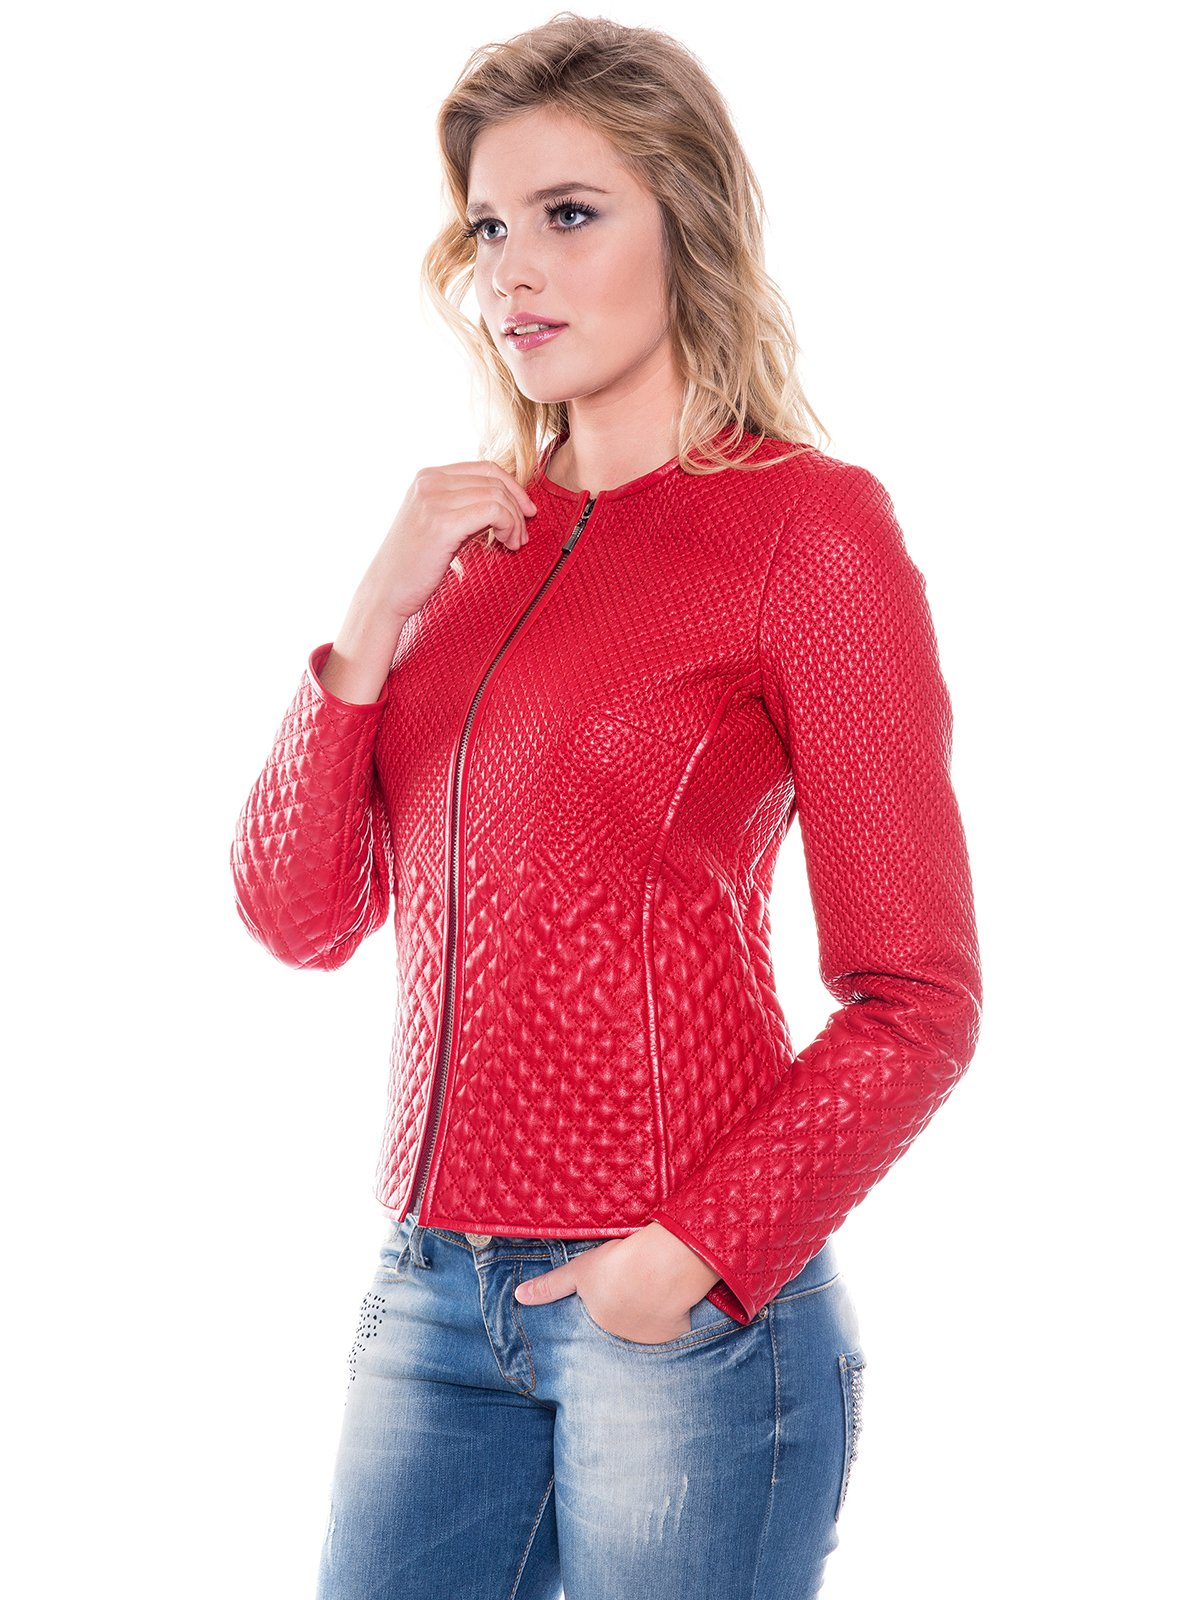 Куртка красная   2033764   фото 4